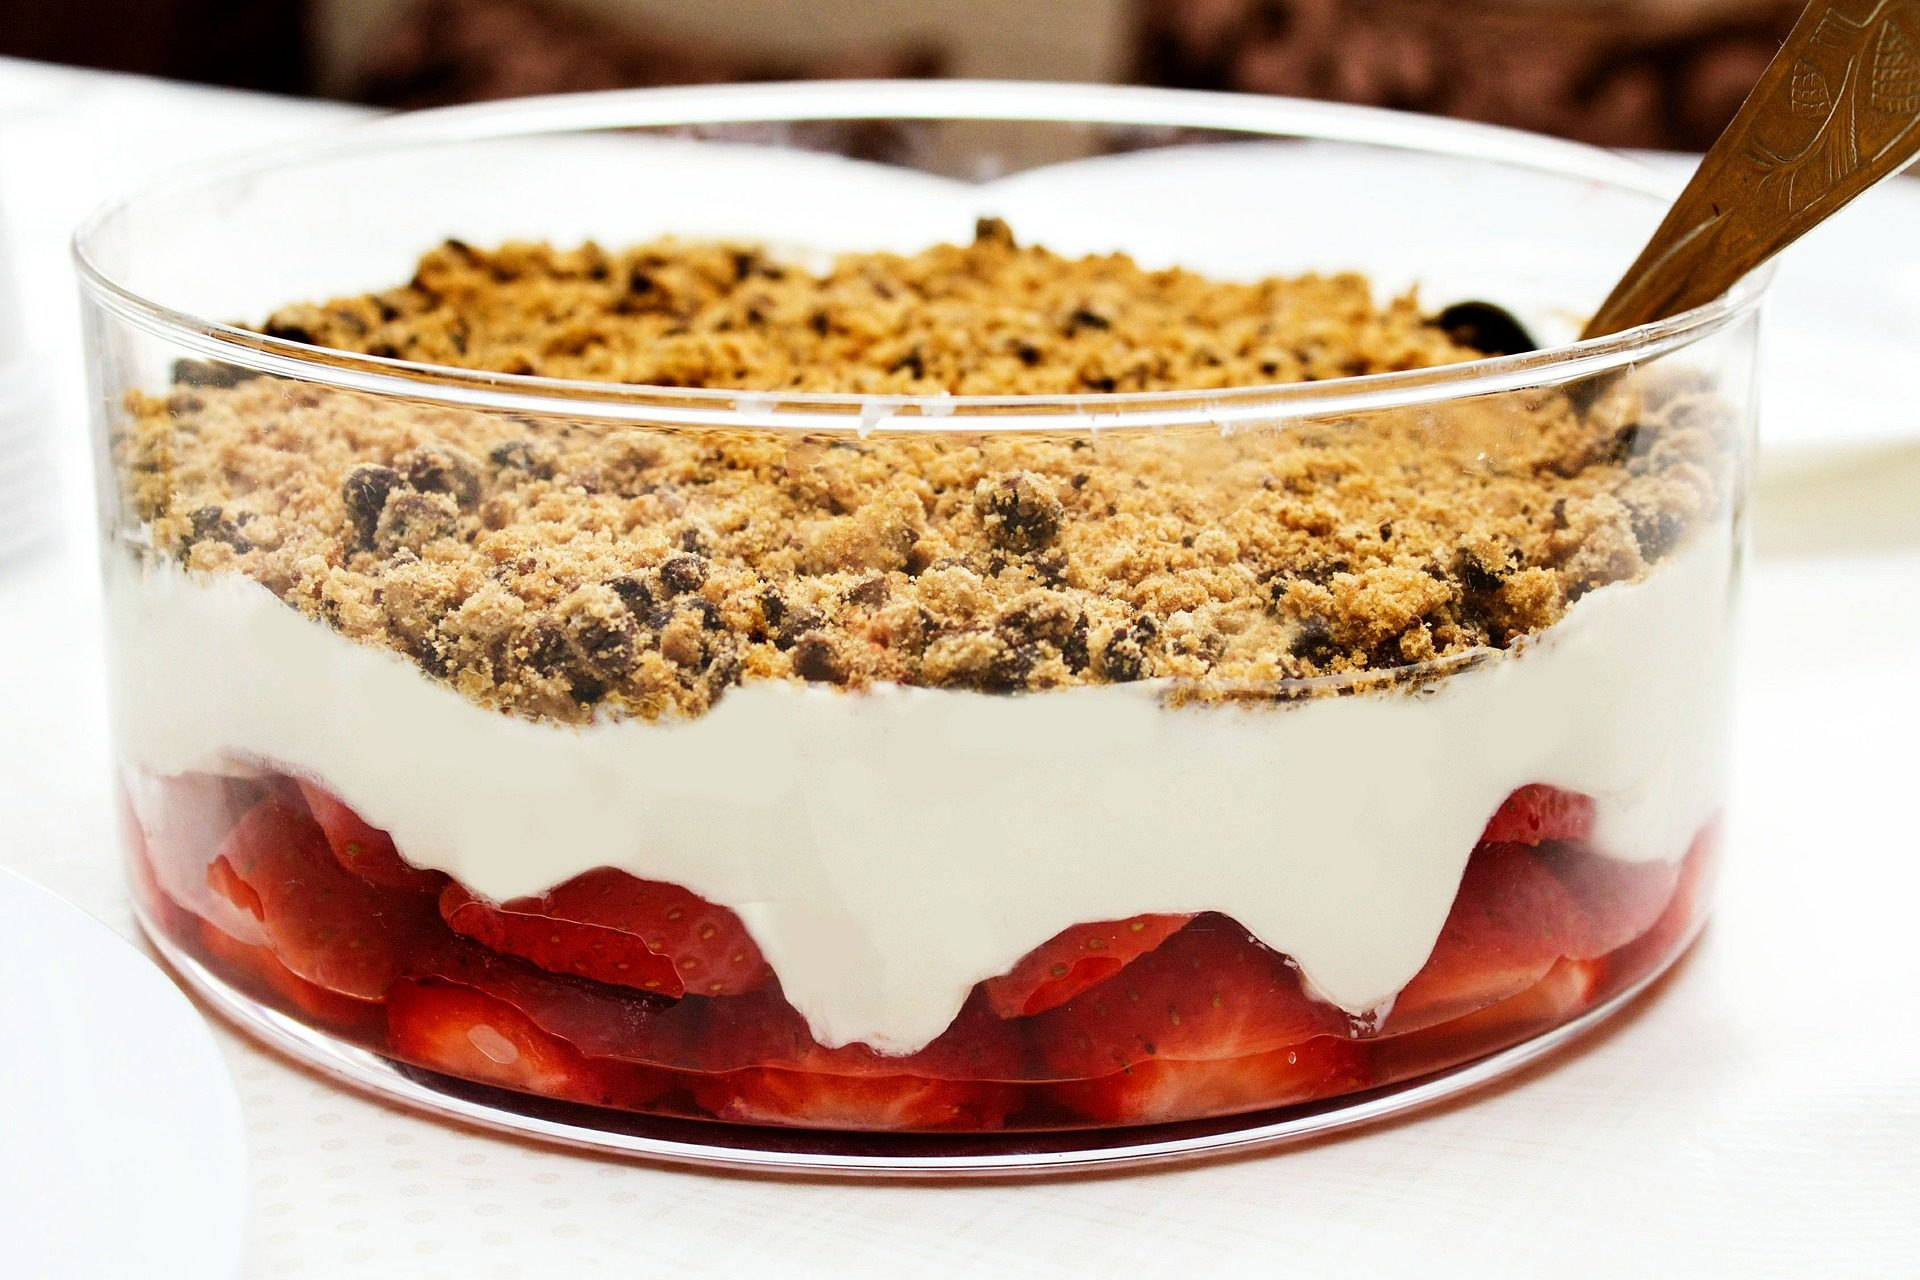 Dessert, süß, Erdbeeren, Müsli, Creme, Kuchen - Wallpaper HD - Prof.-falken.com